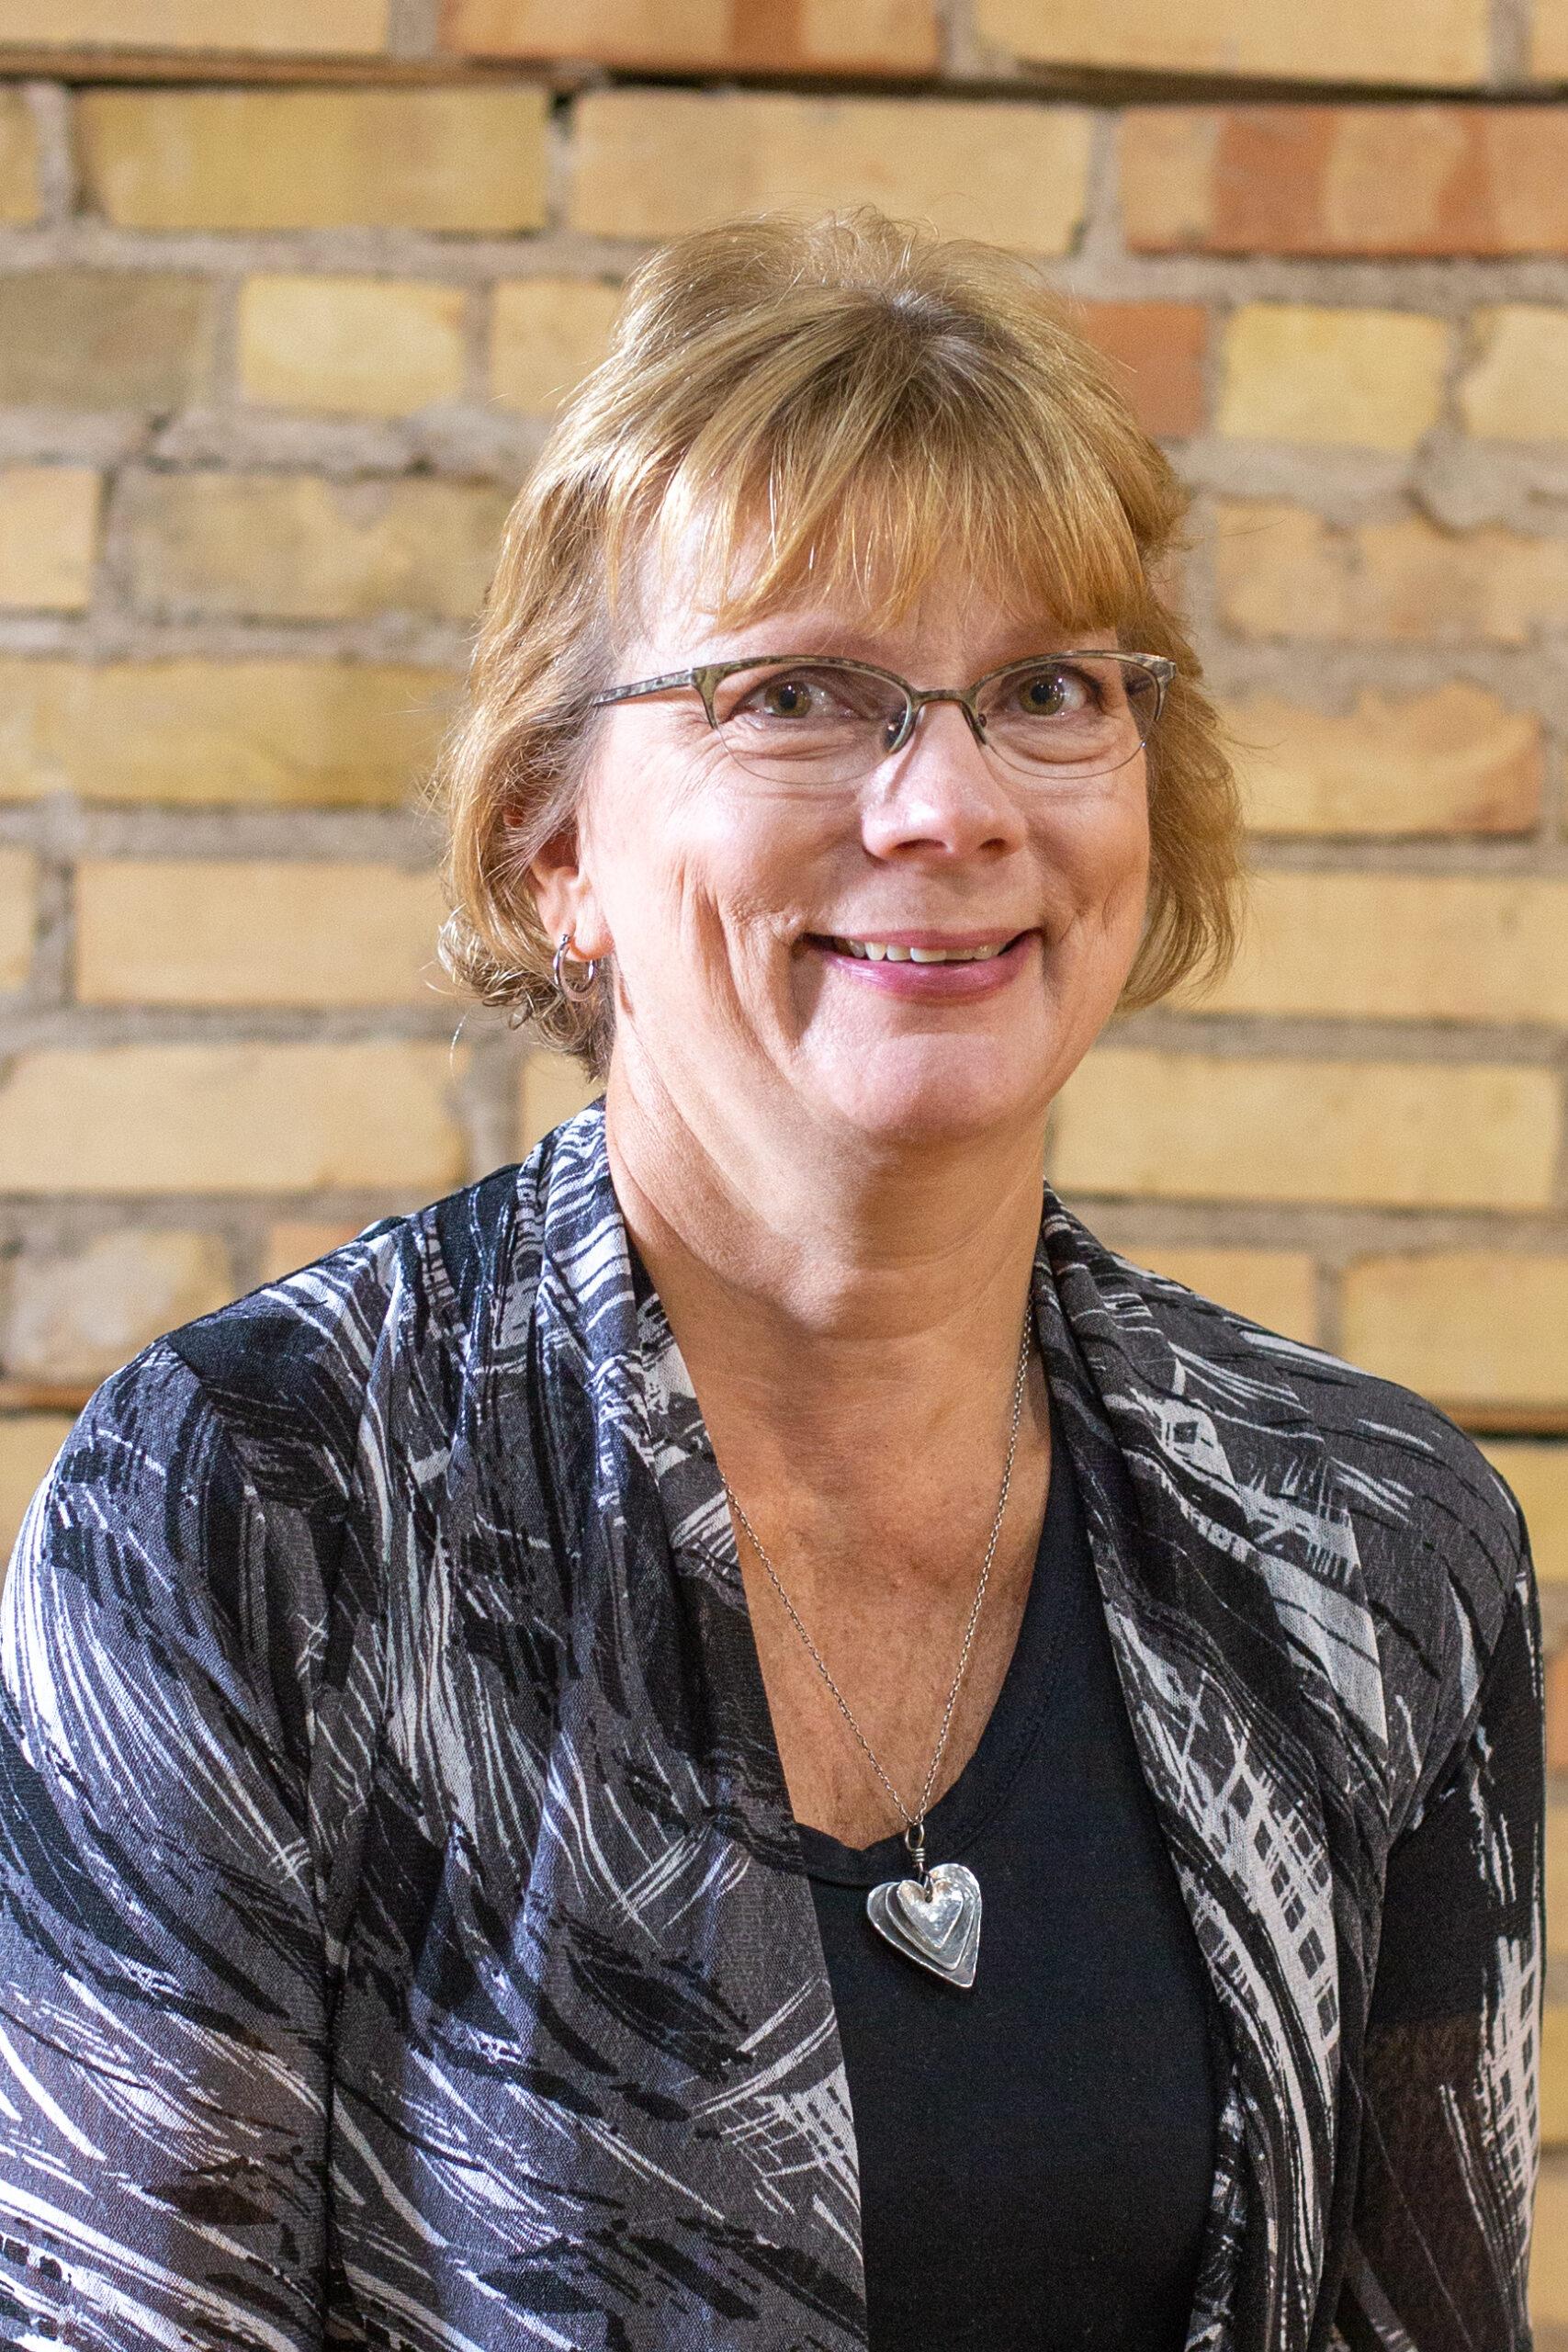 Maija Biondich